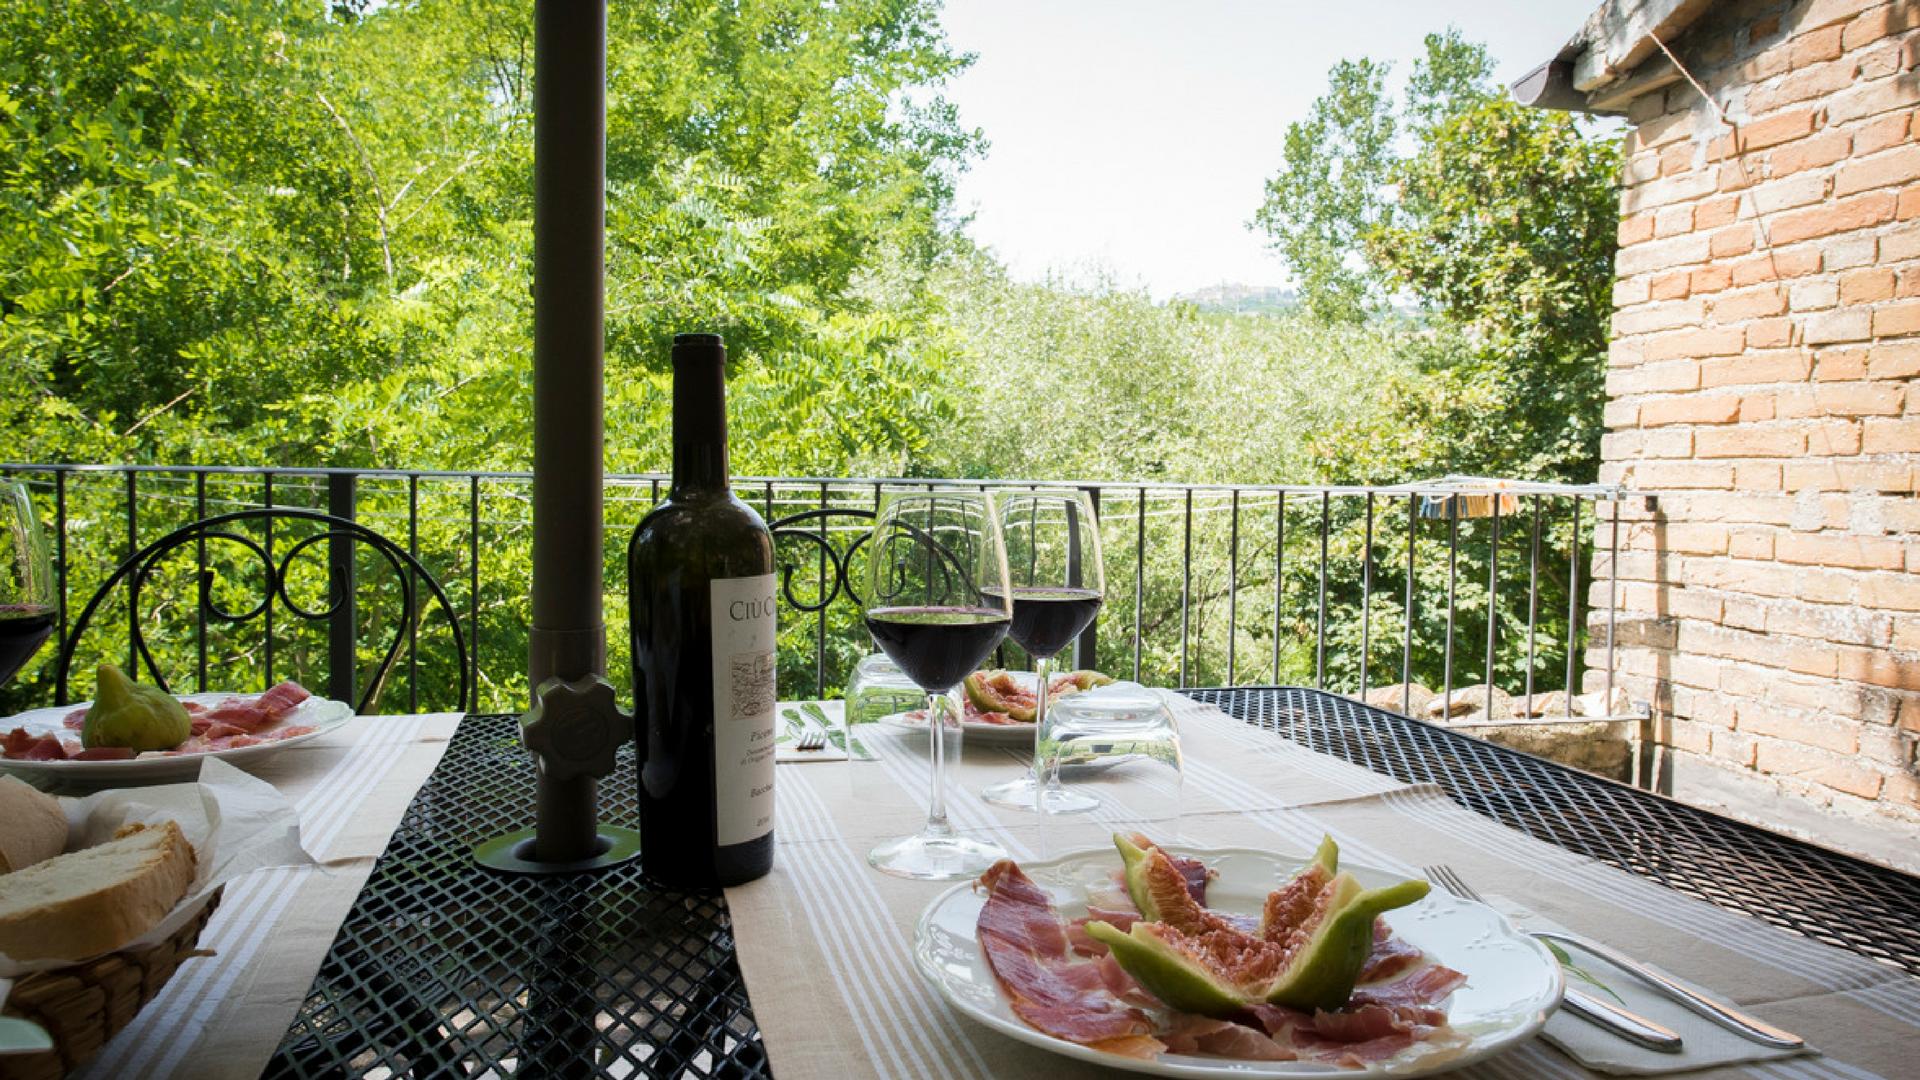 Ham, figs and wine